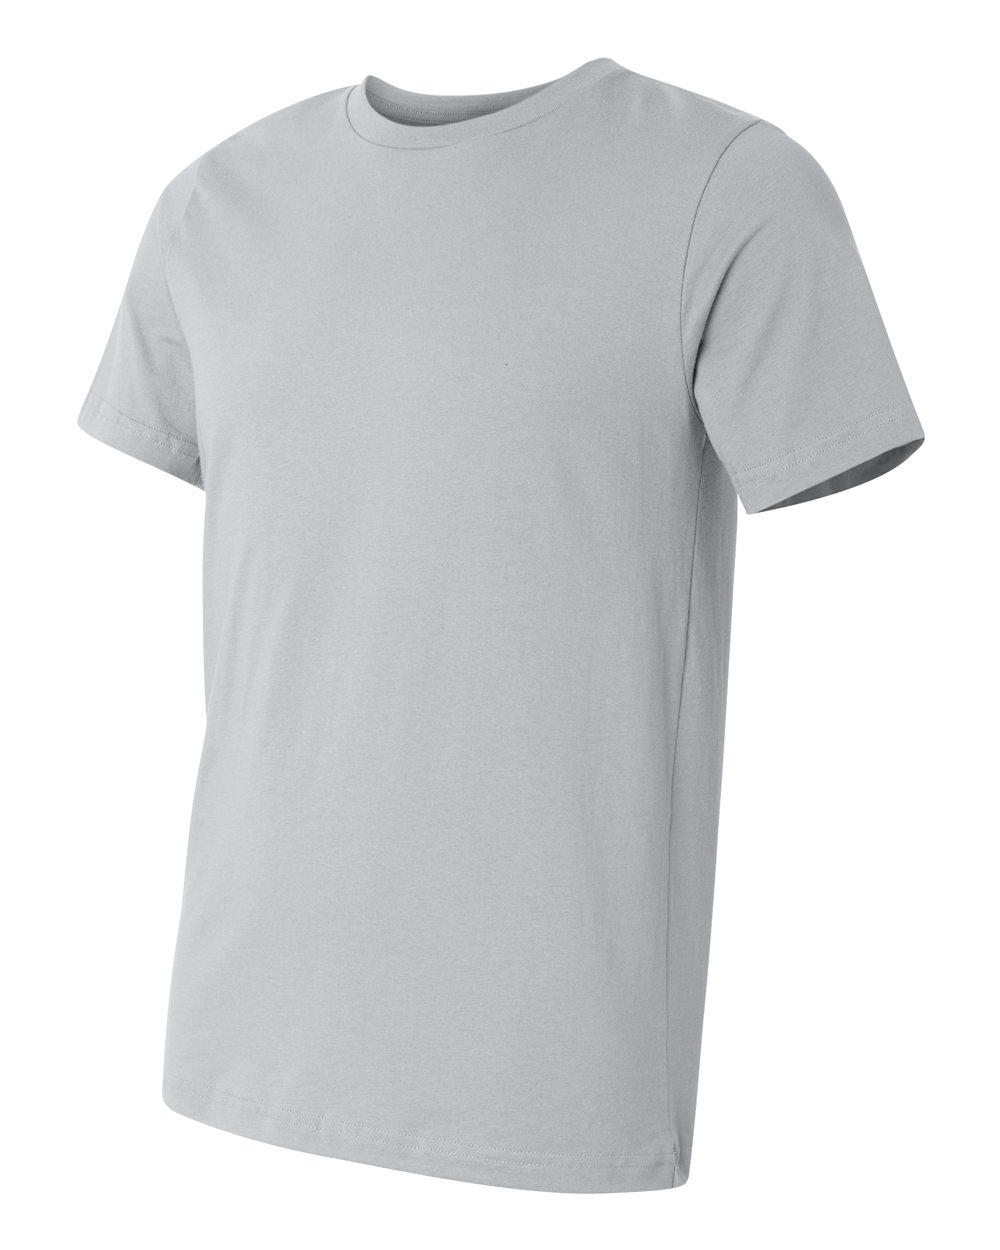 Bella-Canvas-Unisex-Made-in-USA-Jersey-Short-Sleeve-T-Shirt-3001U-XS-3XL thumbnail 33